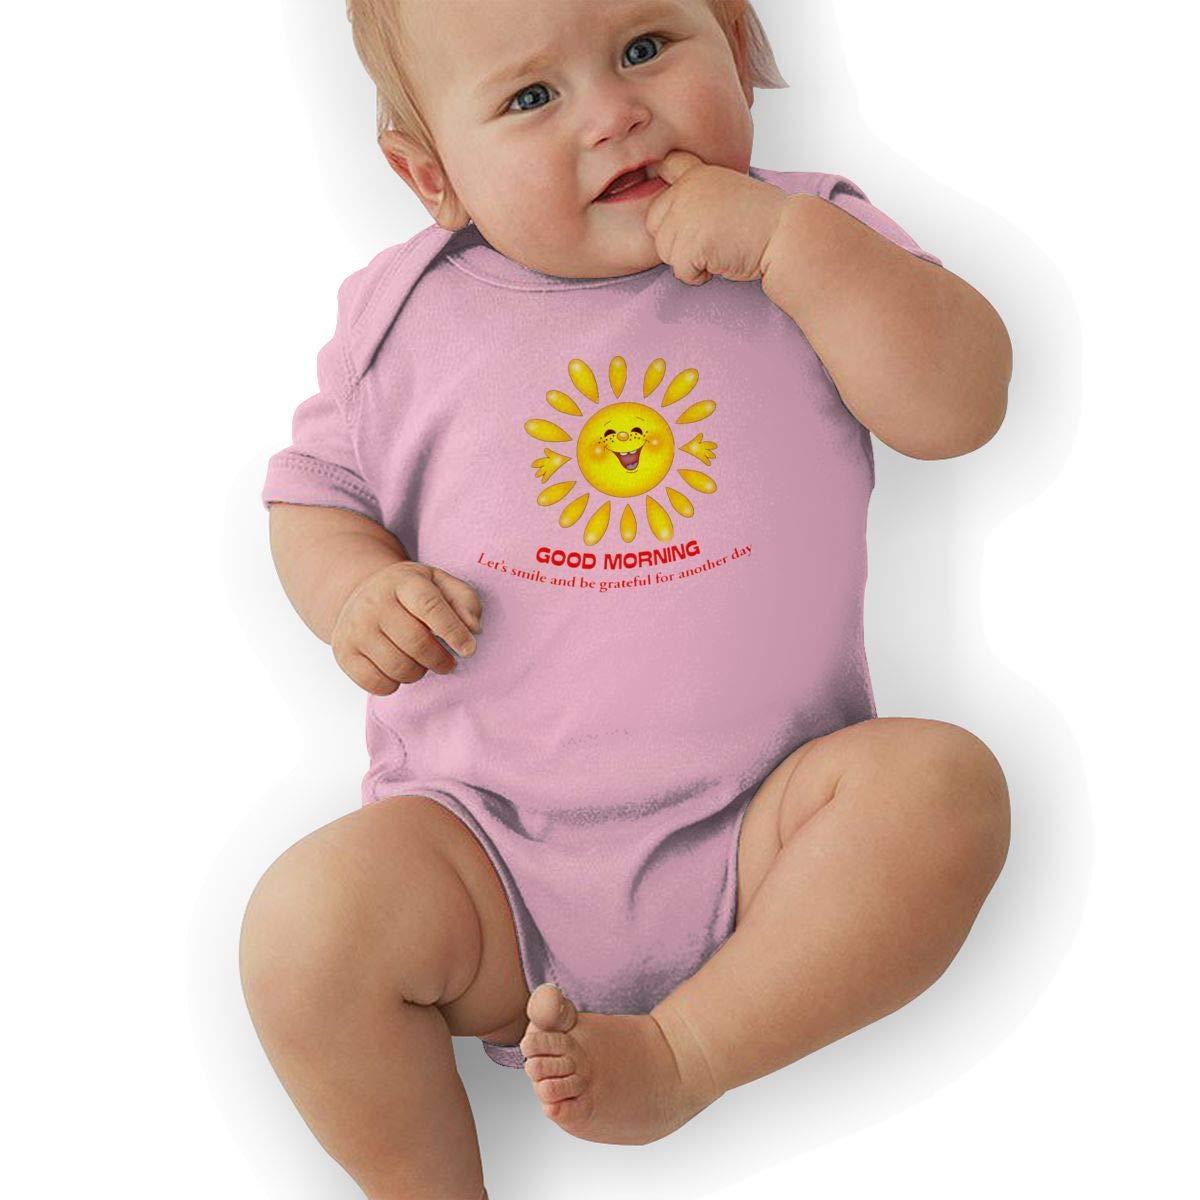 HappyLifea Good Morning Fun Newborn Baby Short Sleeve Romper Infant Summer Clothing